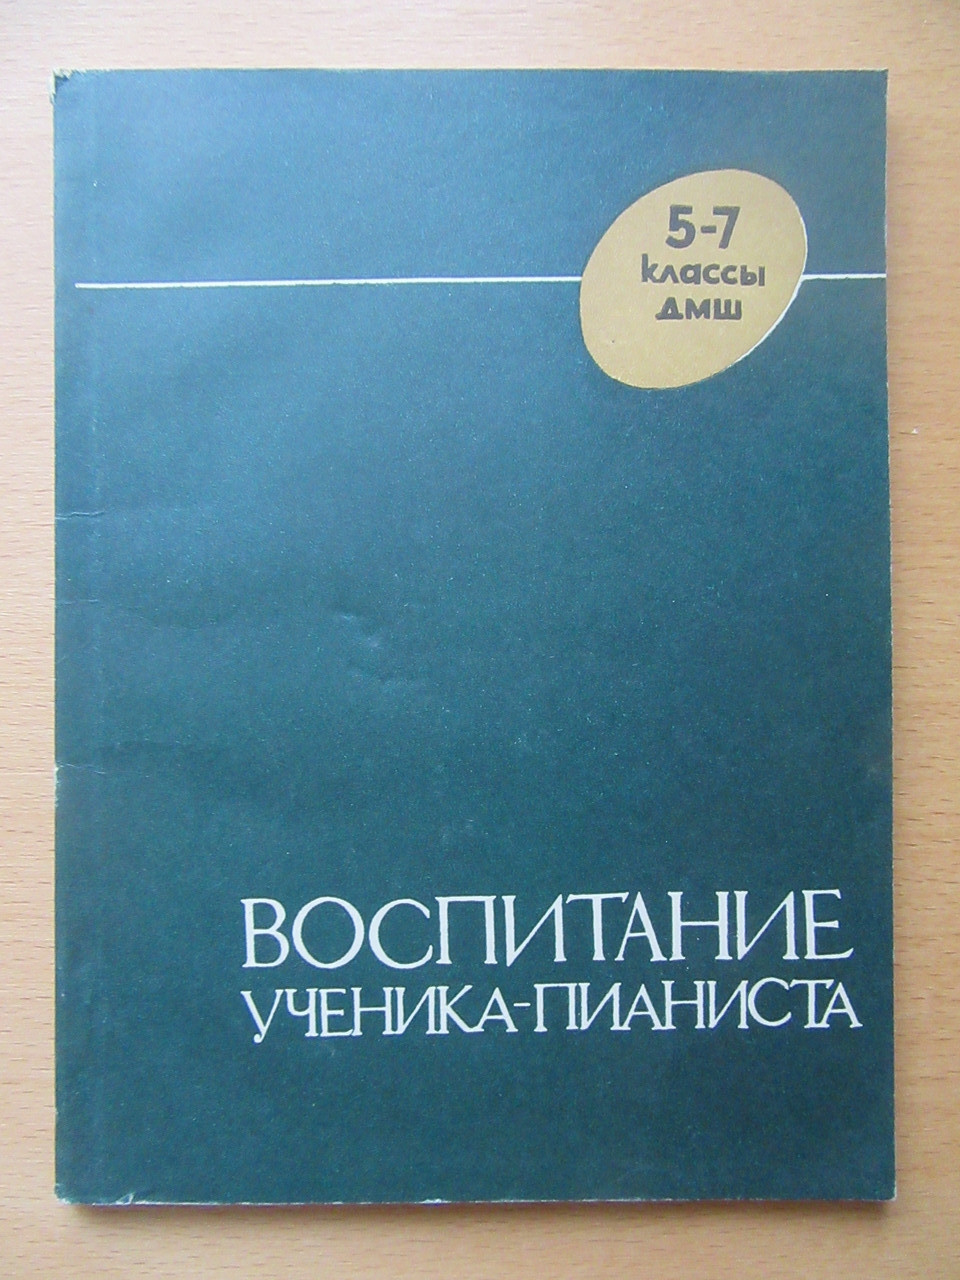 Б.Милич. Воспитание ученика-пианиста. 5-7 классы ДМШ